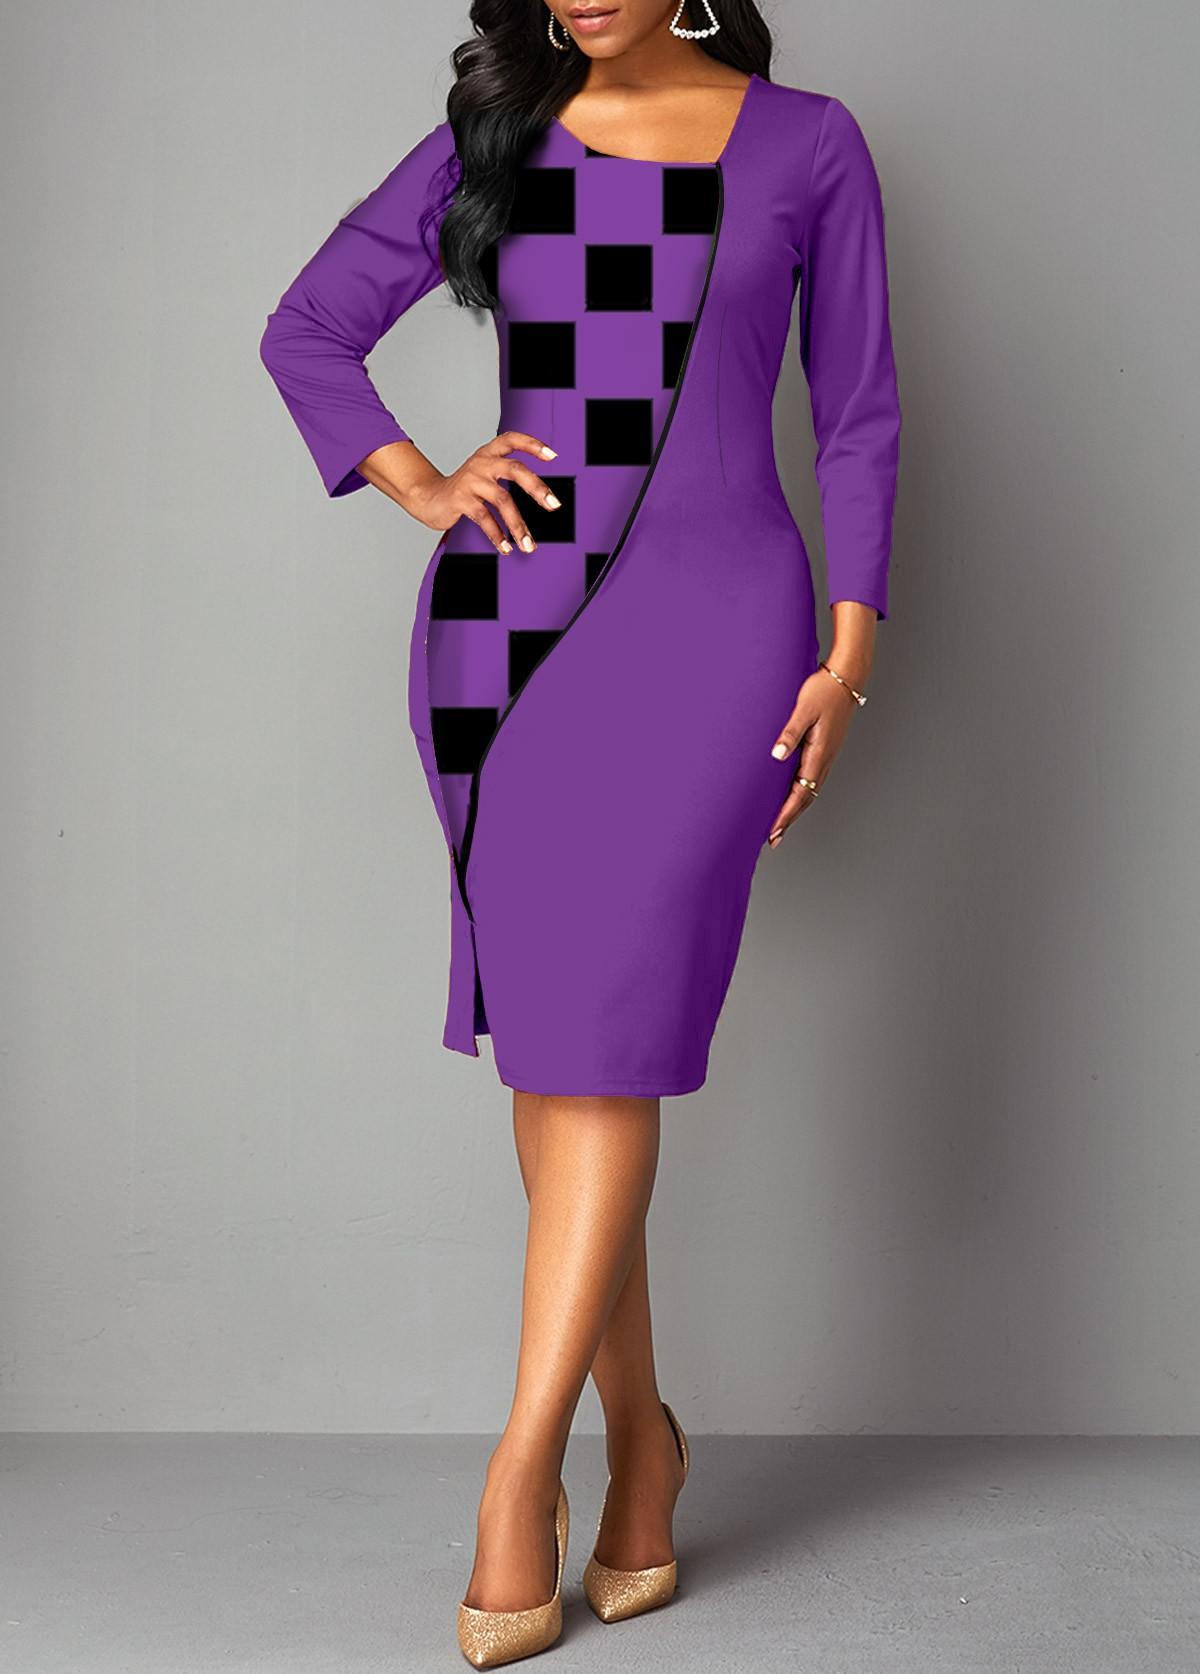 Plaid 3/4 Sleeve Asymmetrical Neck Dress